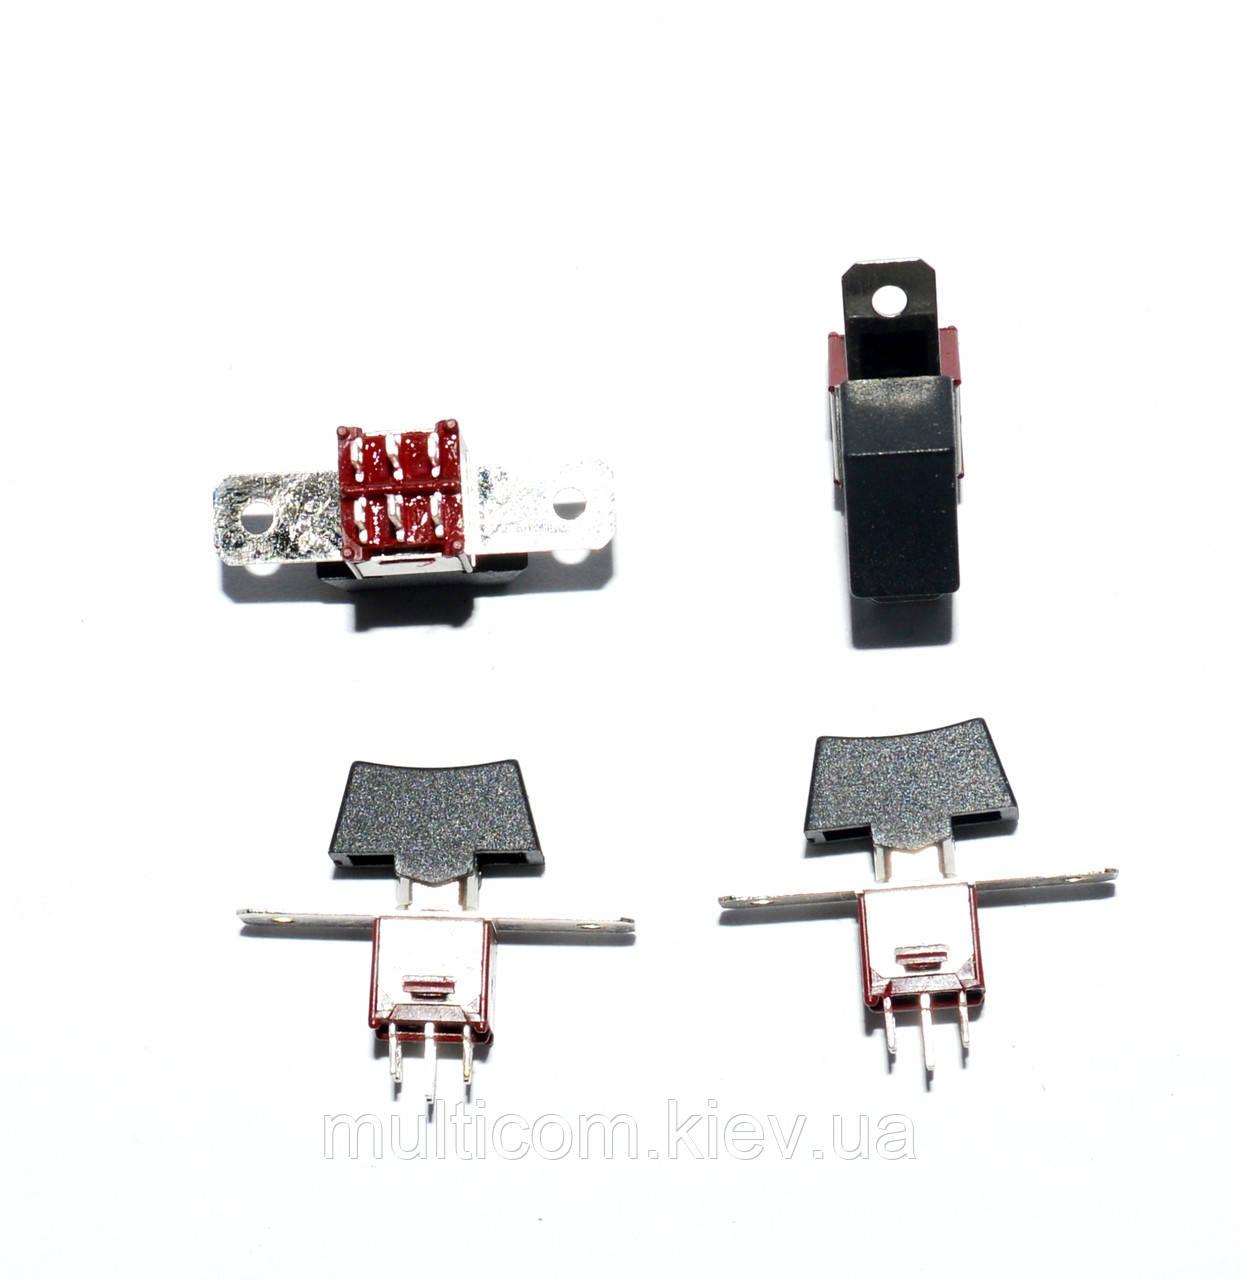 11-00-214. Тумблер с клавишей SRLS-203-A1 (ON-OFF-ON), 6pin, 3А-125V/1,5A-250V